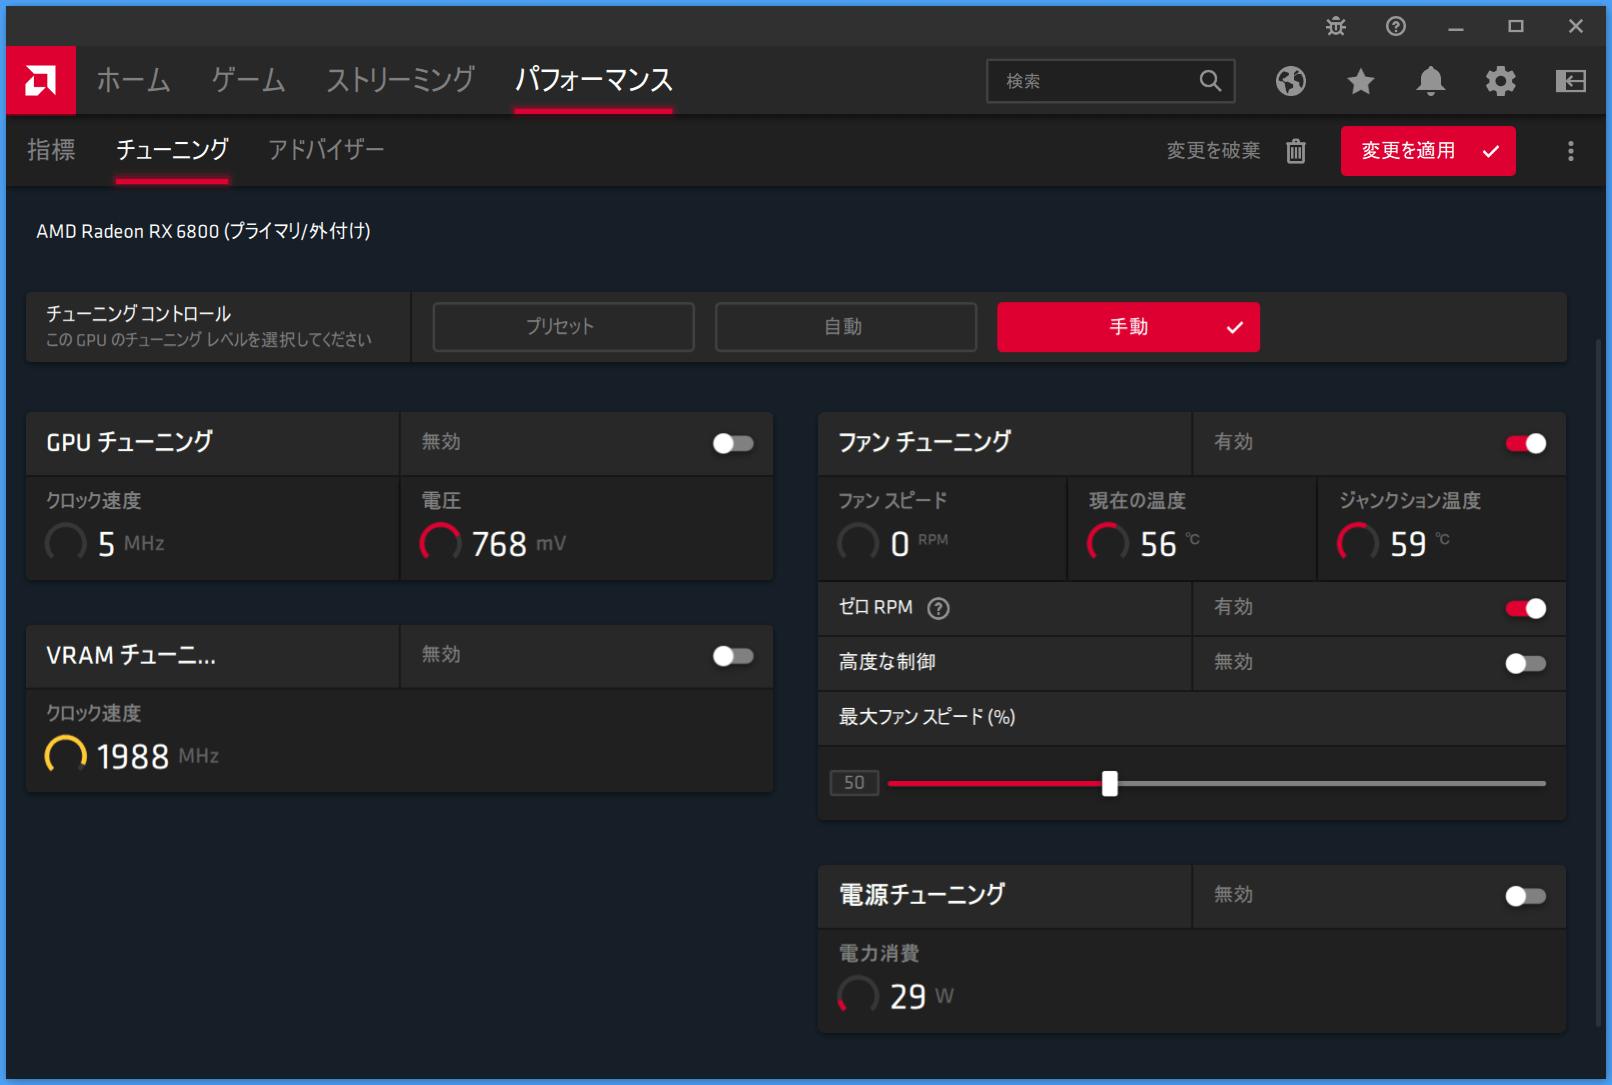 Radeon RX 6800_Radeon-Setting_7-1_Fan